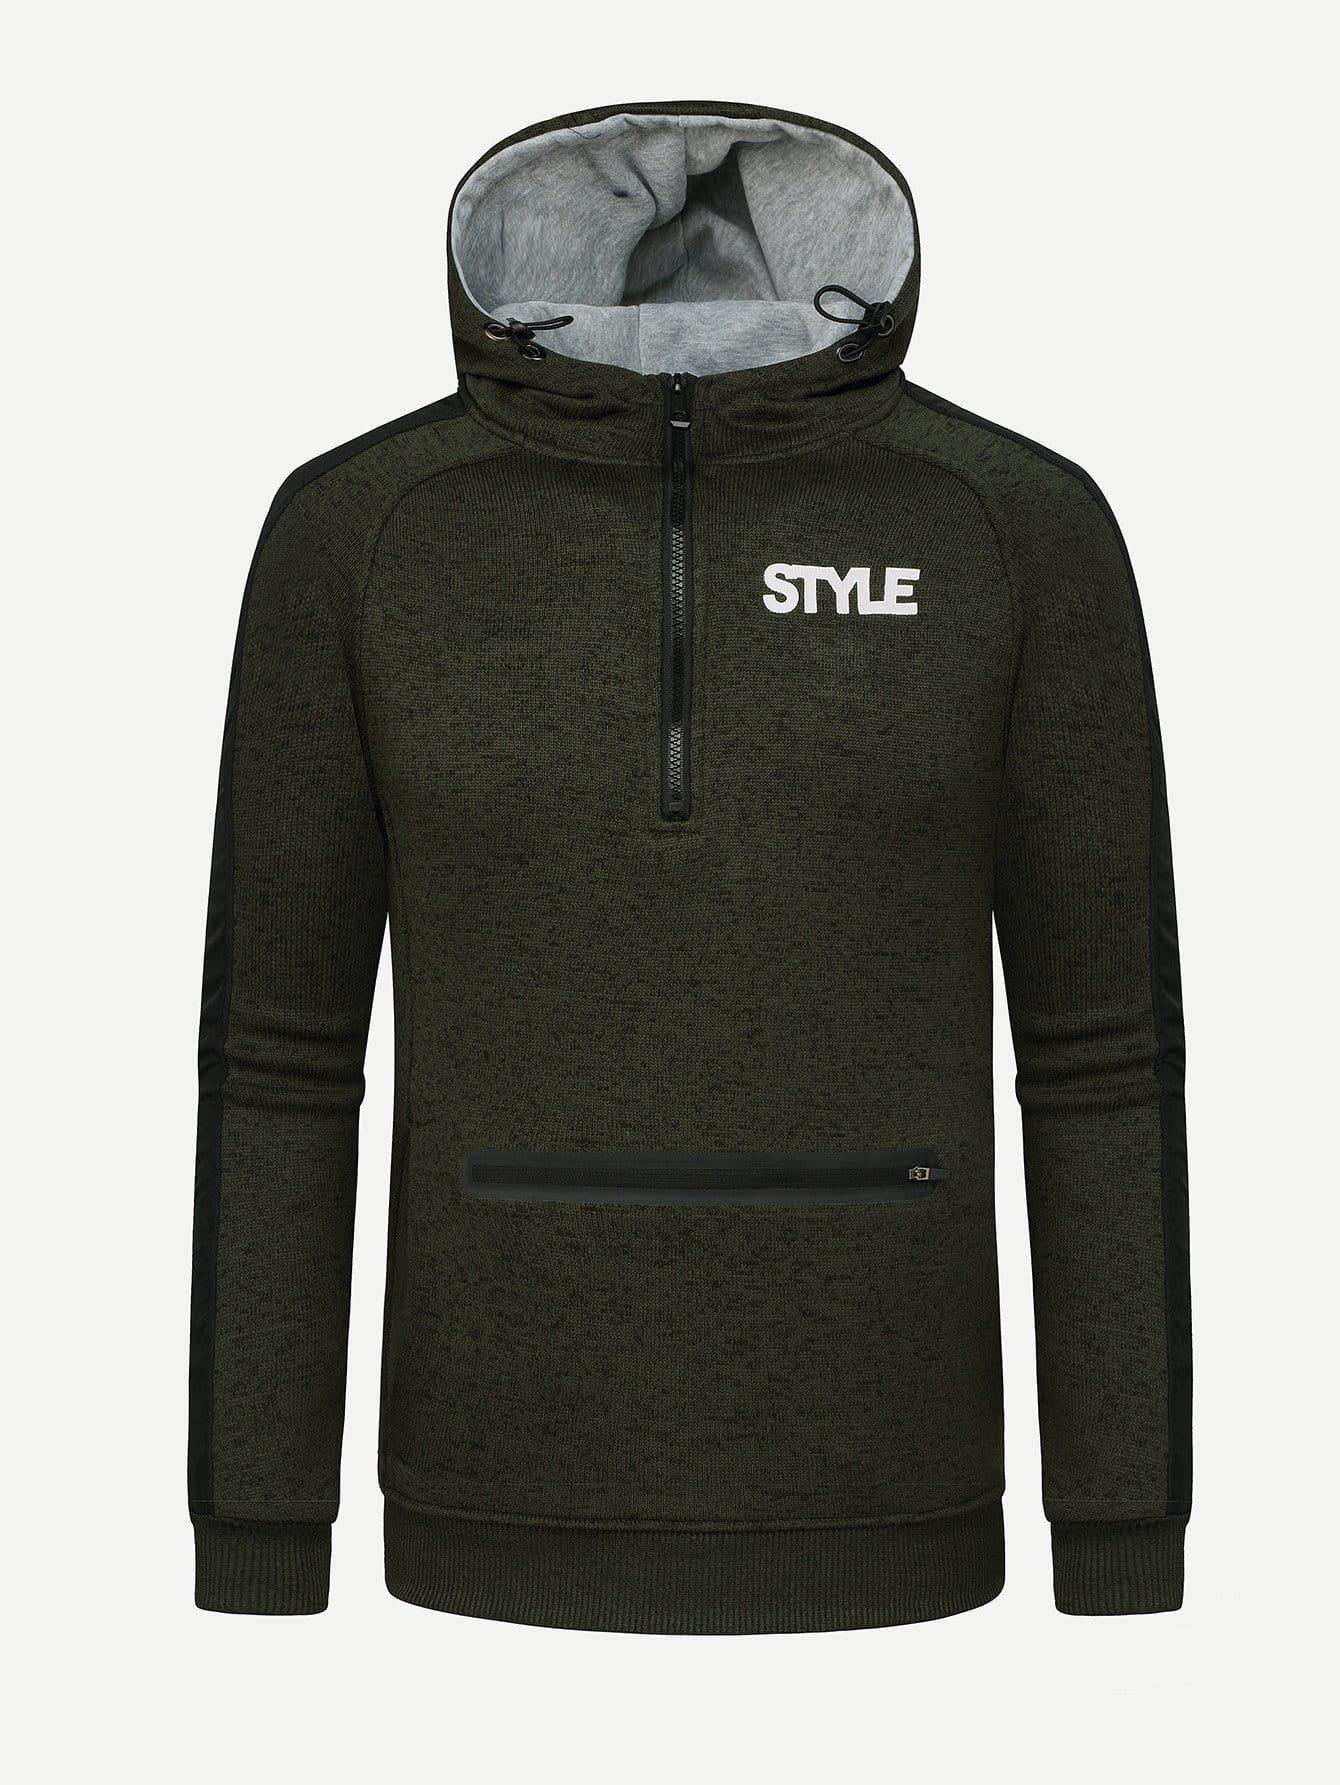 Men Zipper Detail Letter Print Hooded Sweatshirt